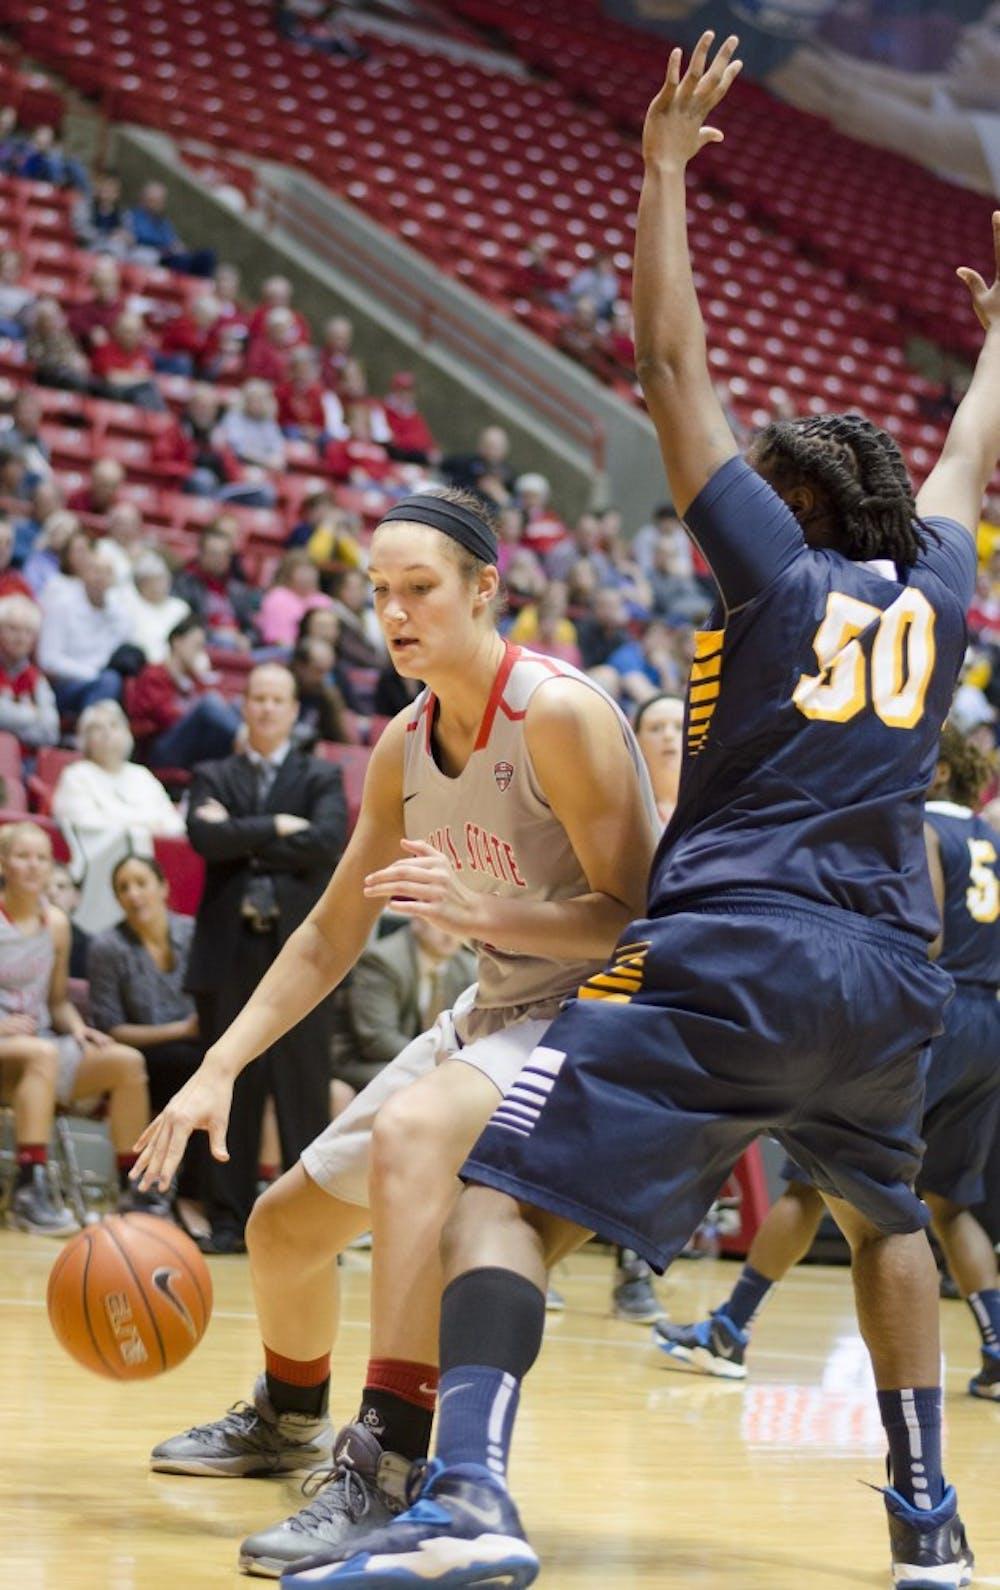 Freshman center Renee Bennett tries to get past a Toledo player on March 8 at Worthen Arena. Bennett scored six points. DN PHOTO BREANNA DAUGHERTY